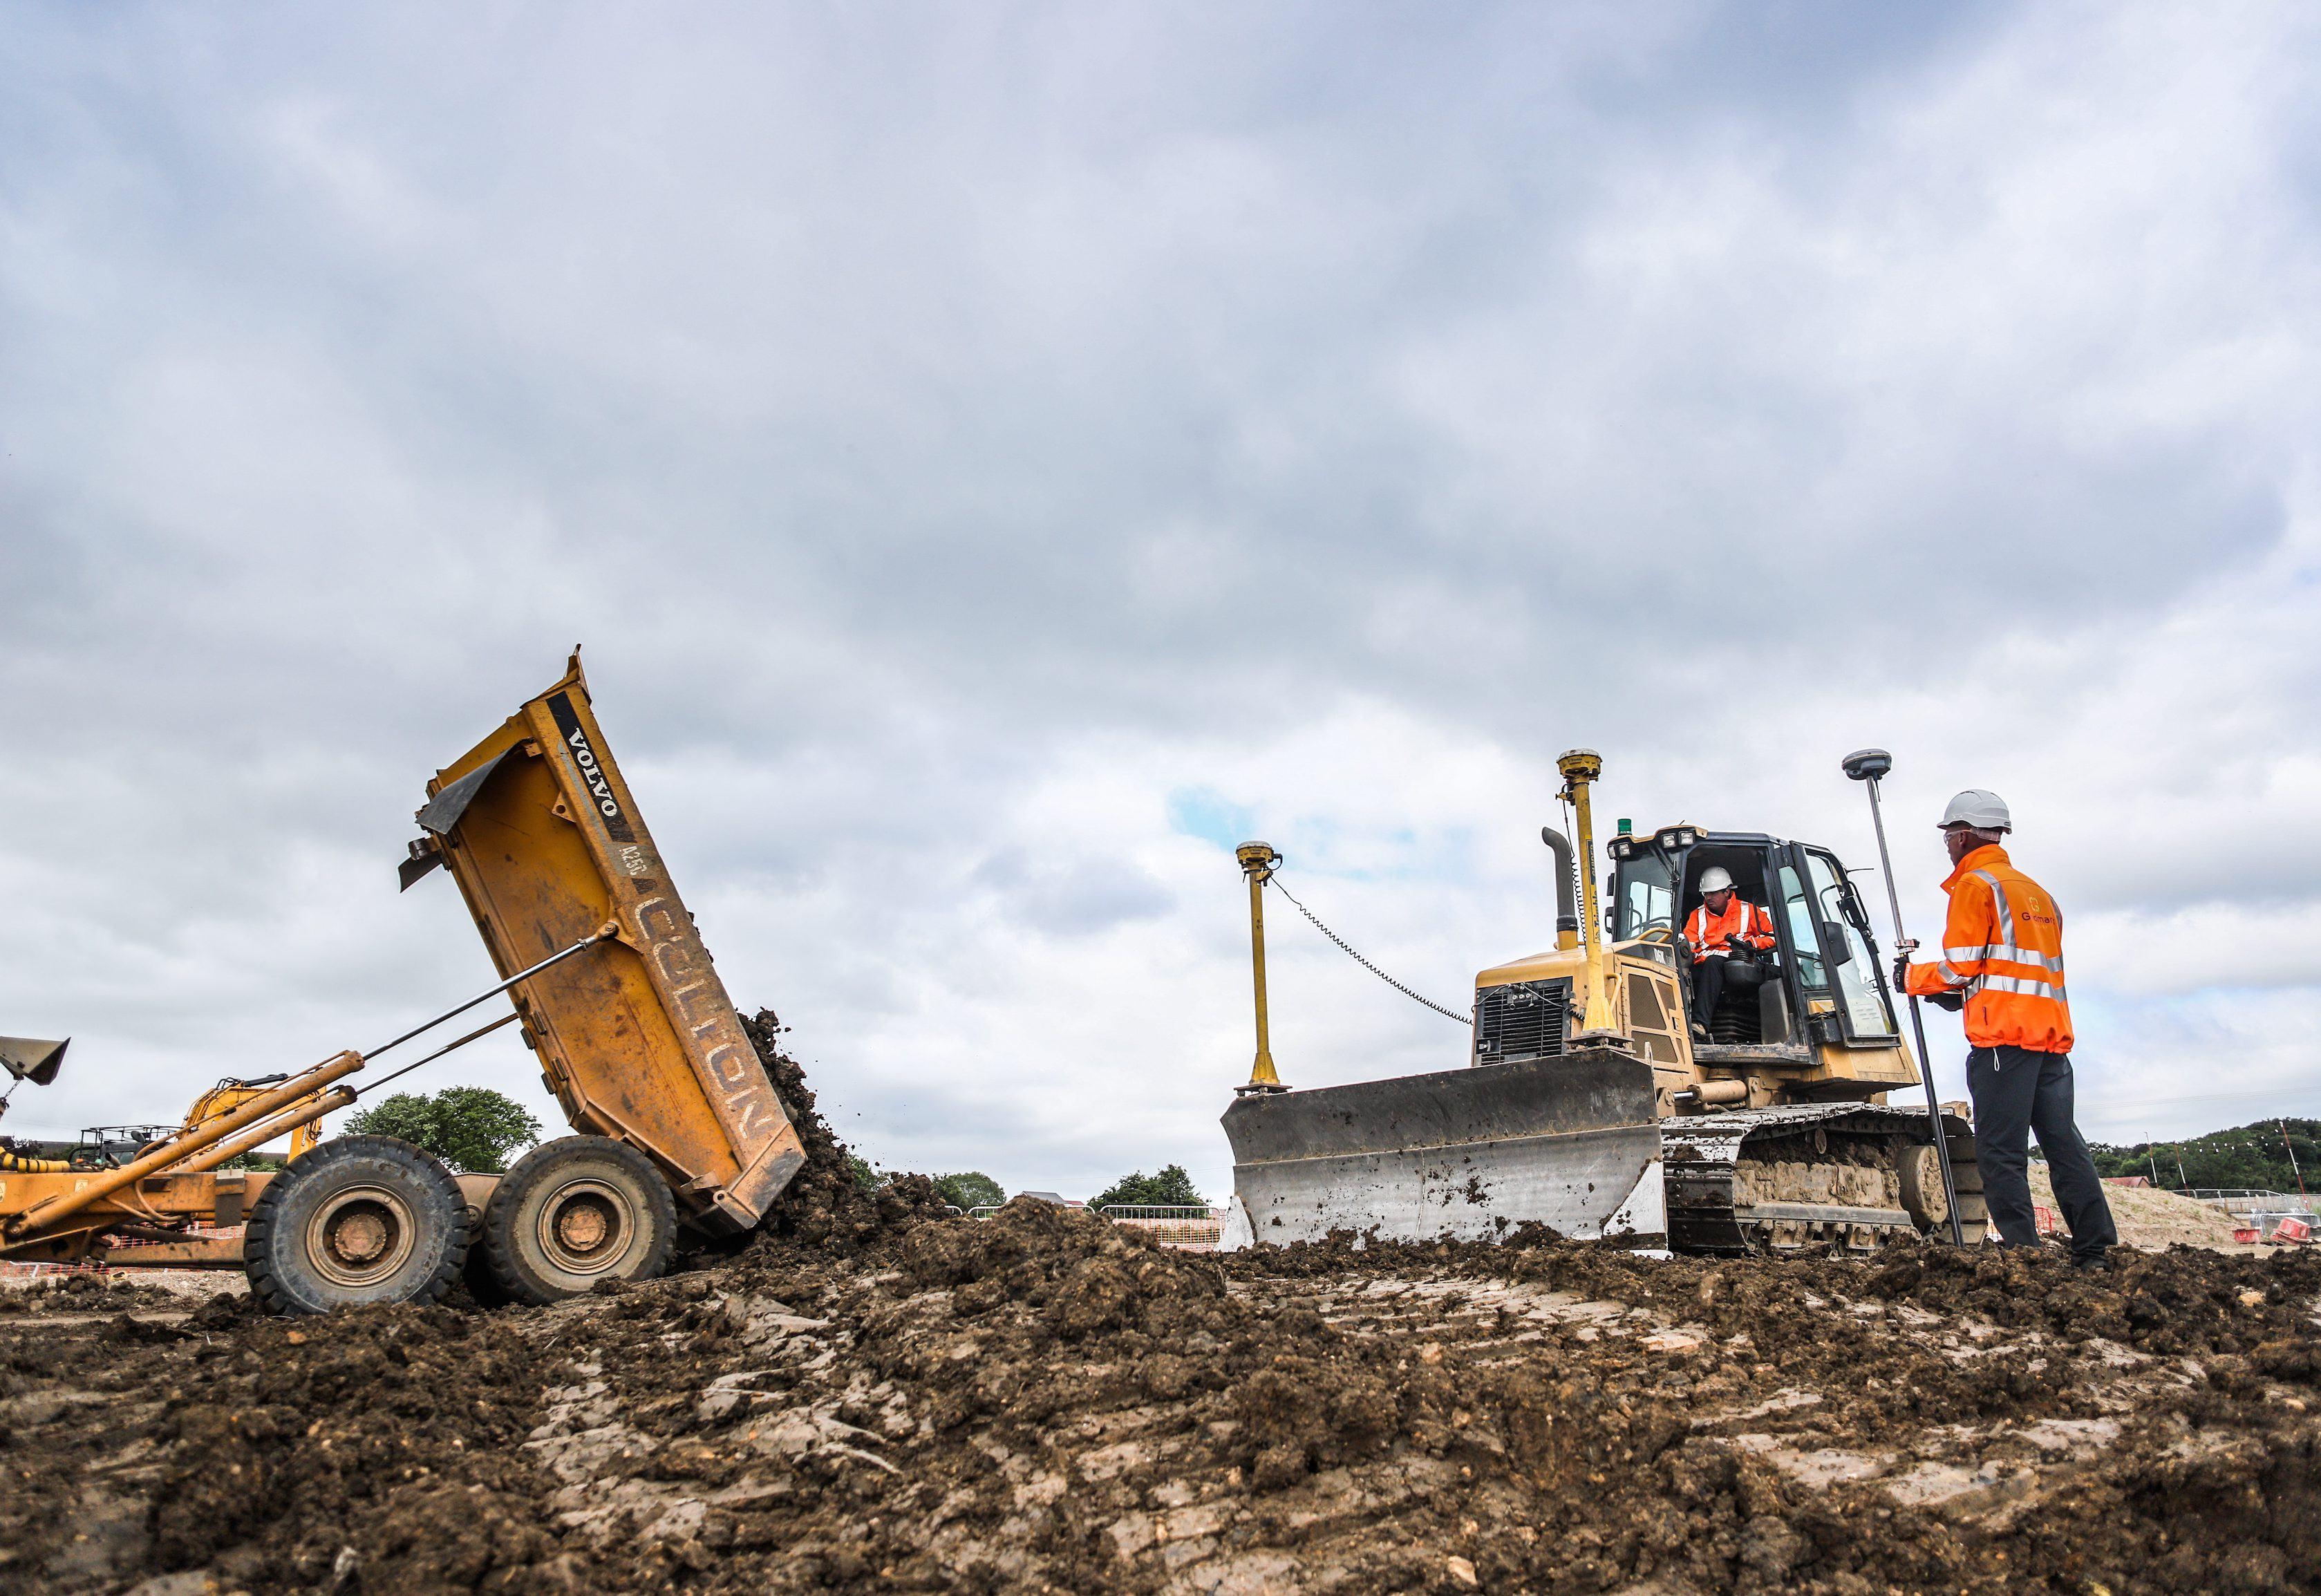 worker maneuvering a bulldozer